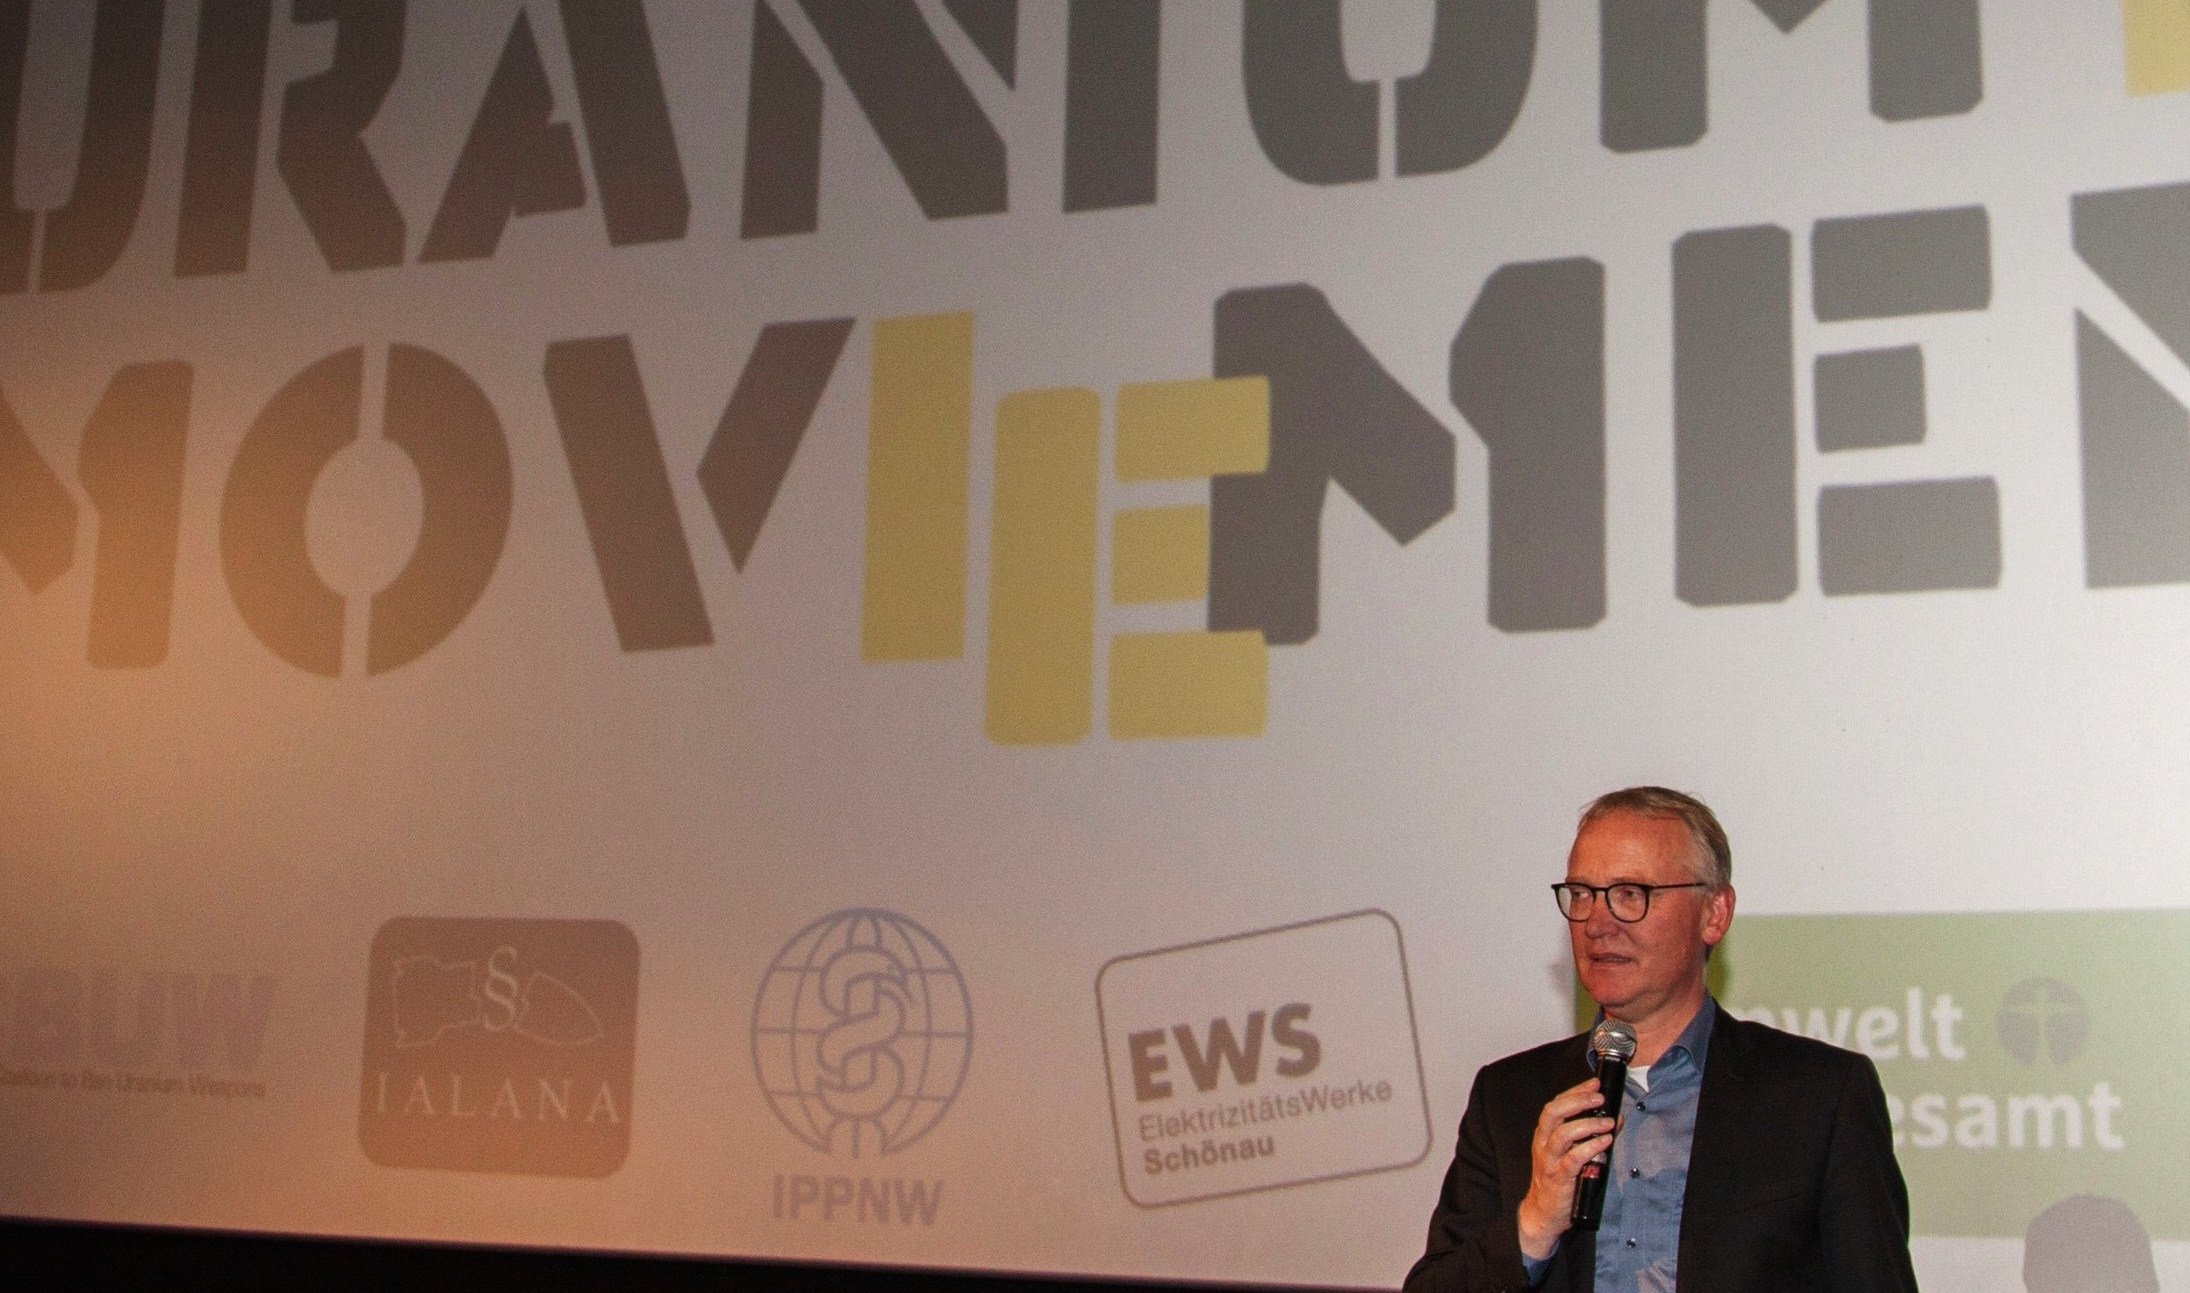 Klaus Mindrup (MdB) beim Uranium Film Festival in Berlin